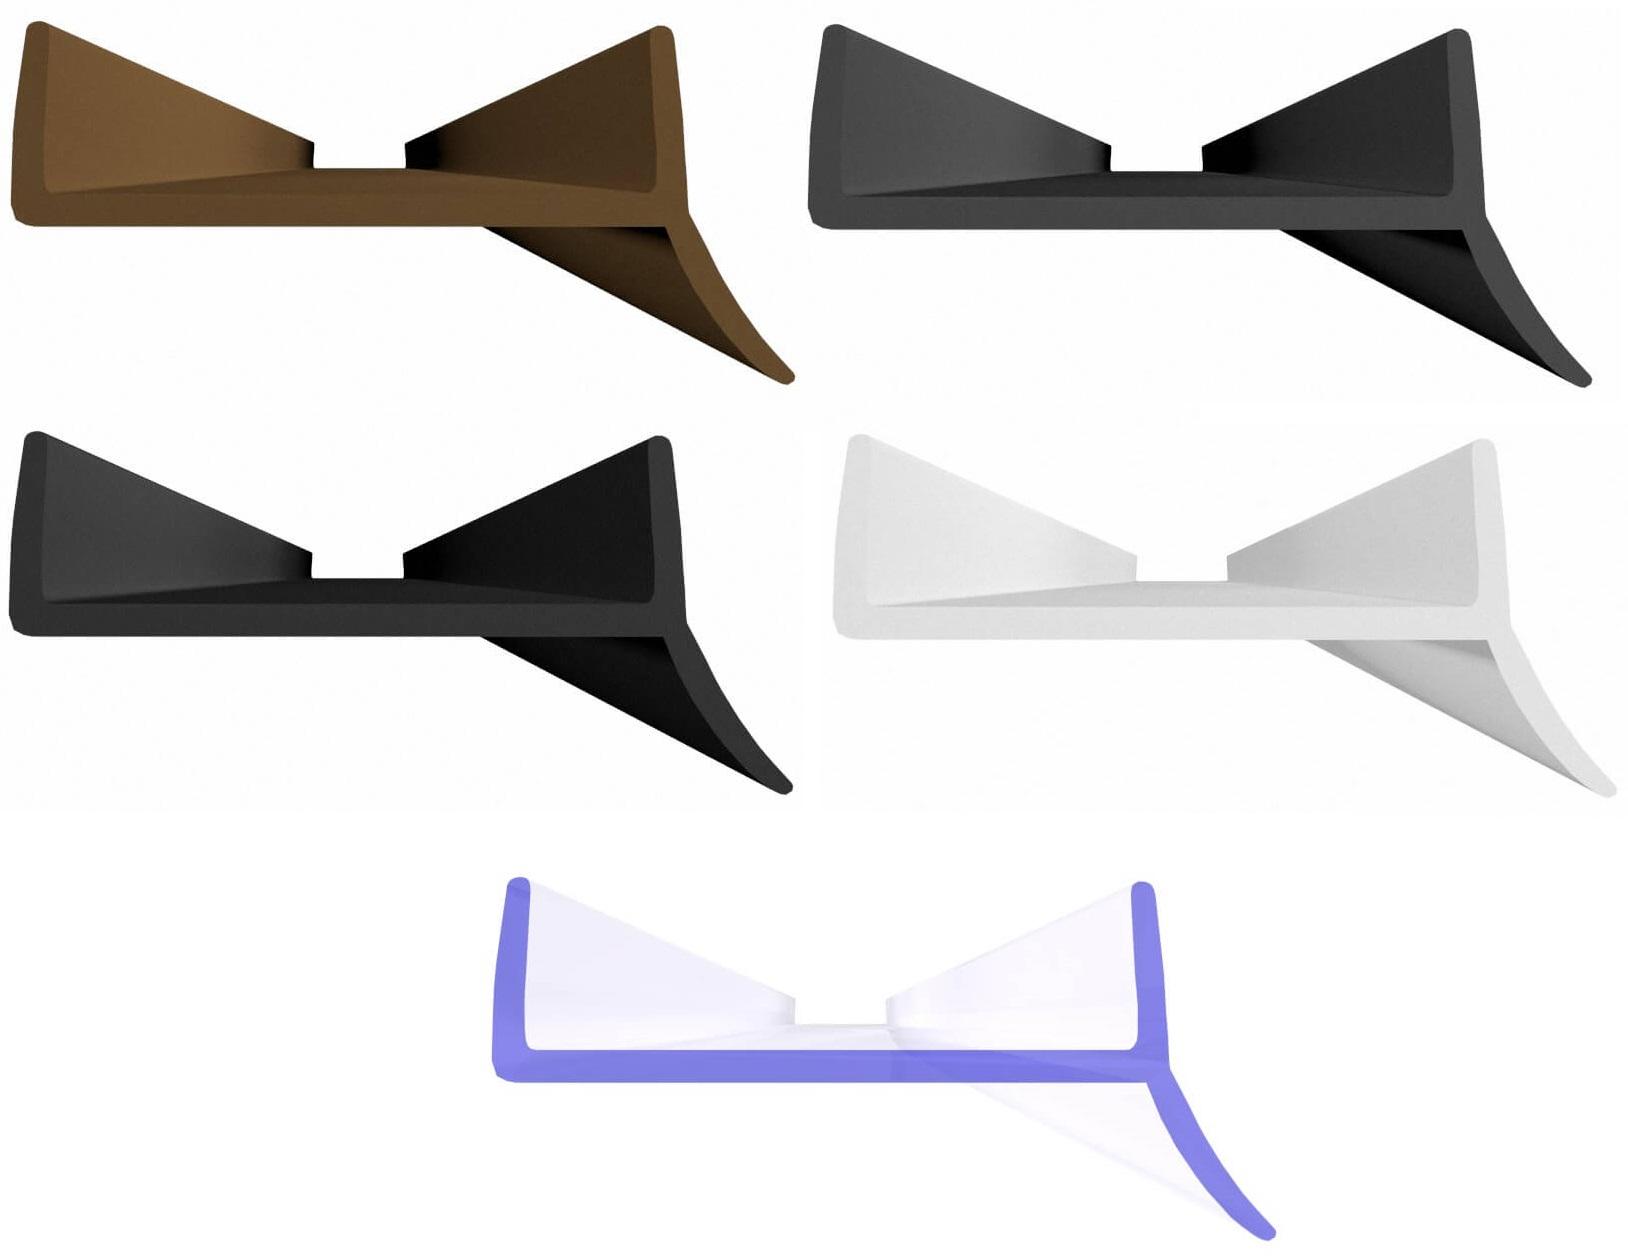 k chensockel abdichtungsprofil. Black Bedroom Furniture Sets. Home Design Ideas